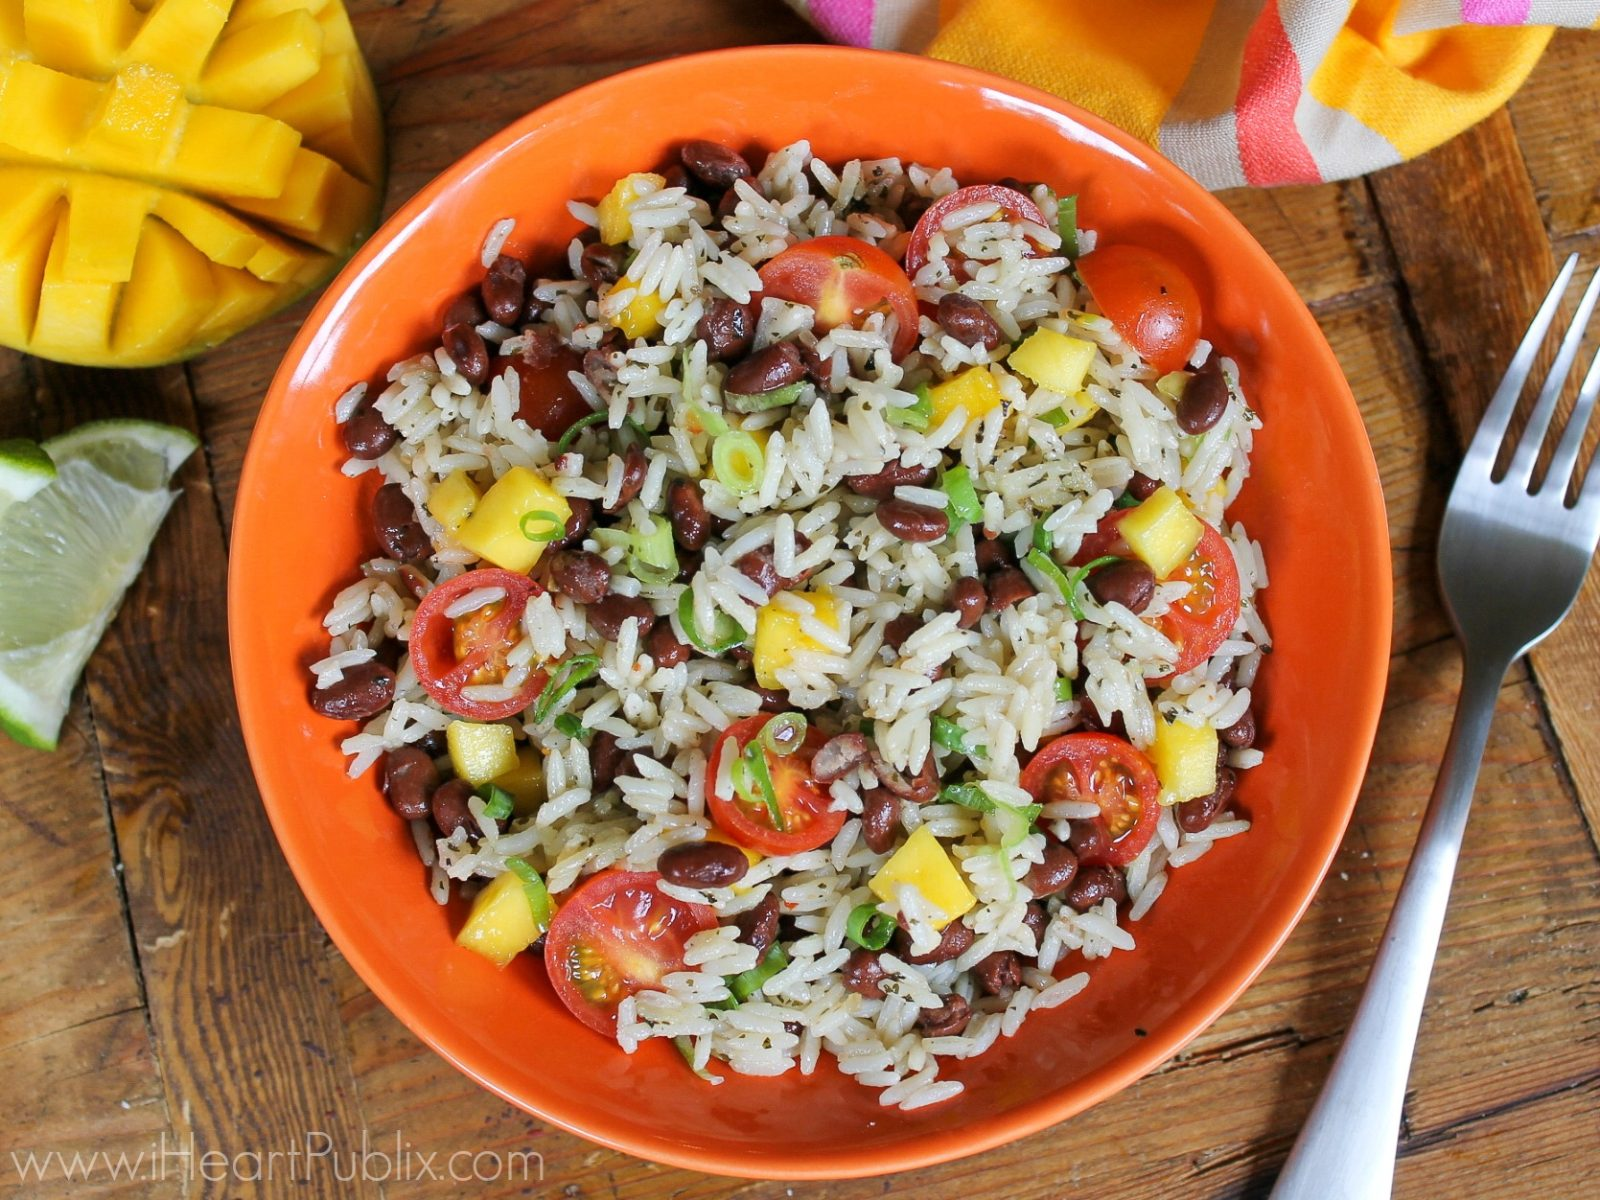 Black Beans and Rice Mango Salad on I Heart Publix